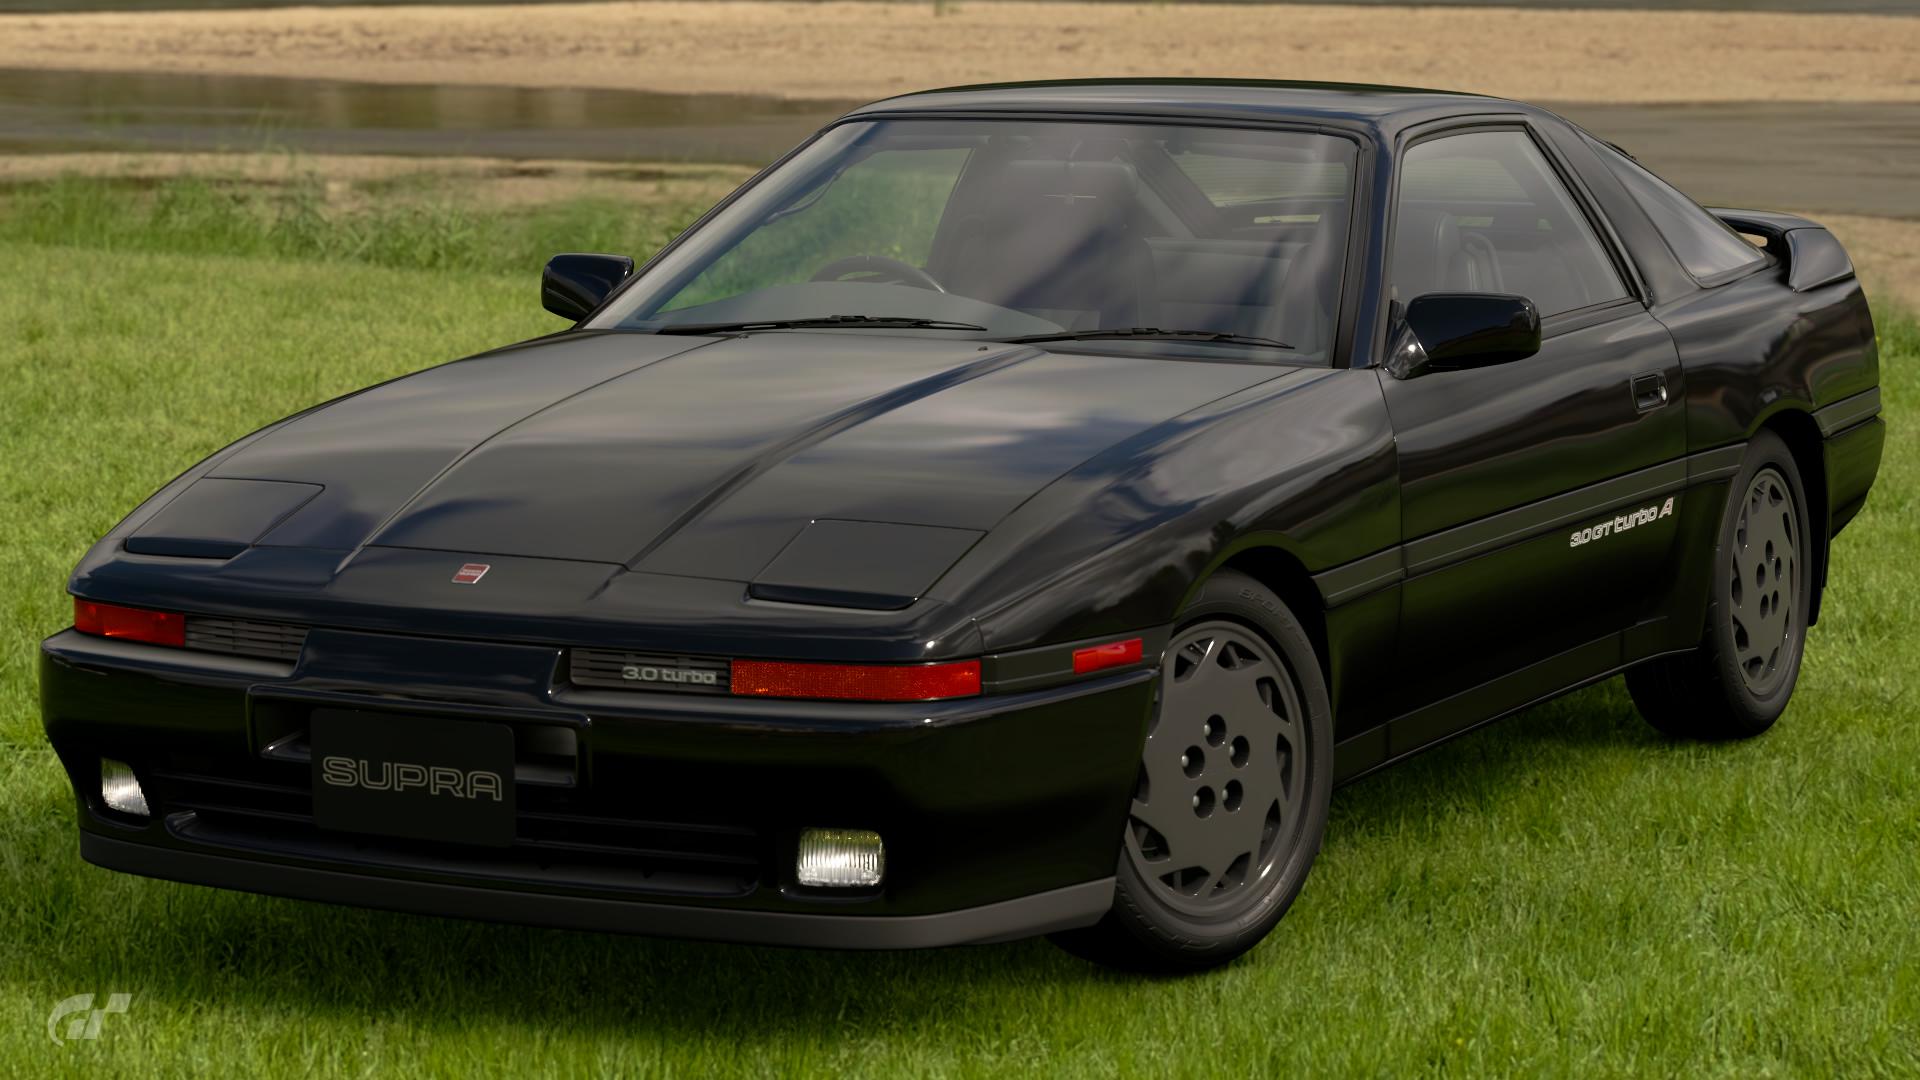 Kelebihan Kekurangan Toyota Supra 1988 Harga